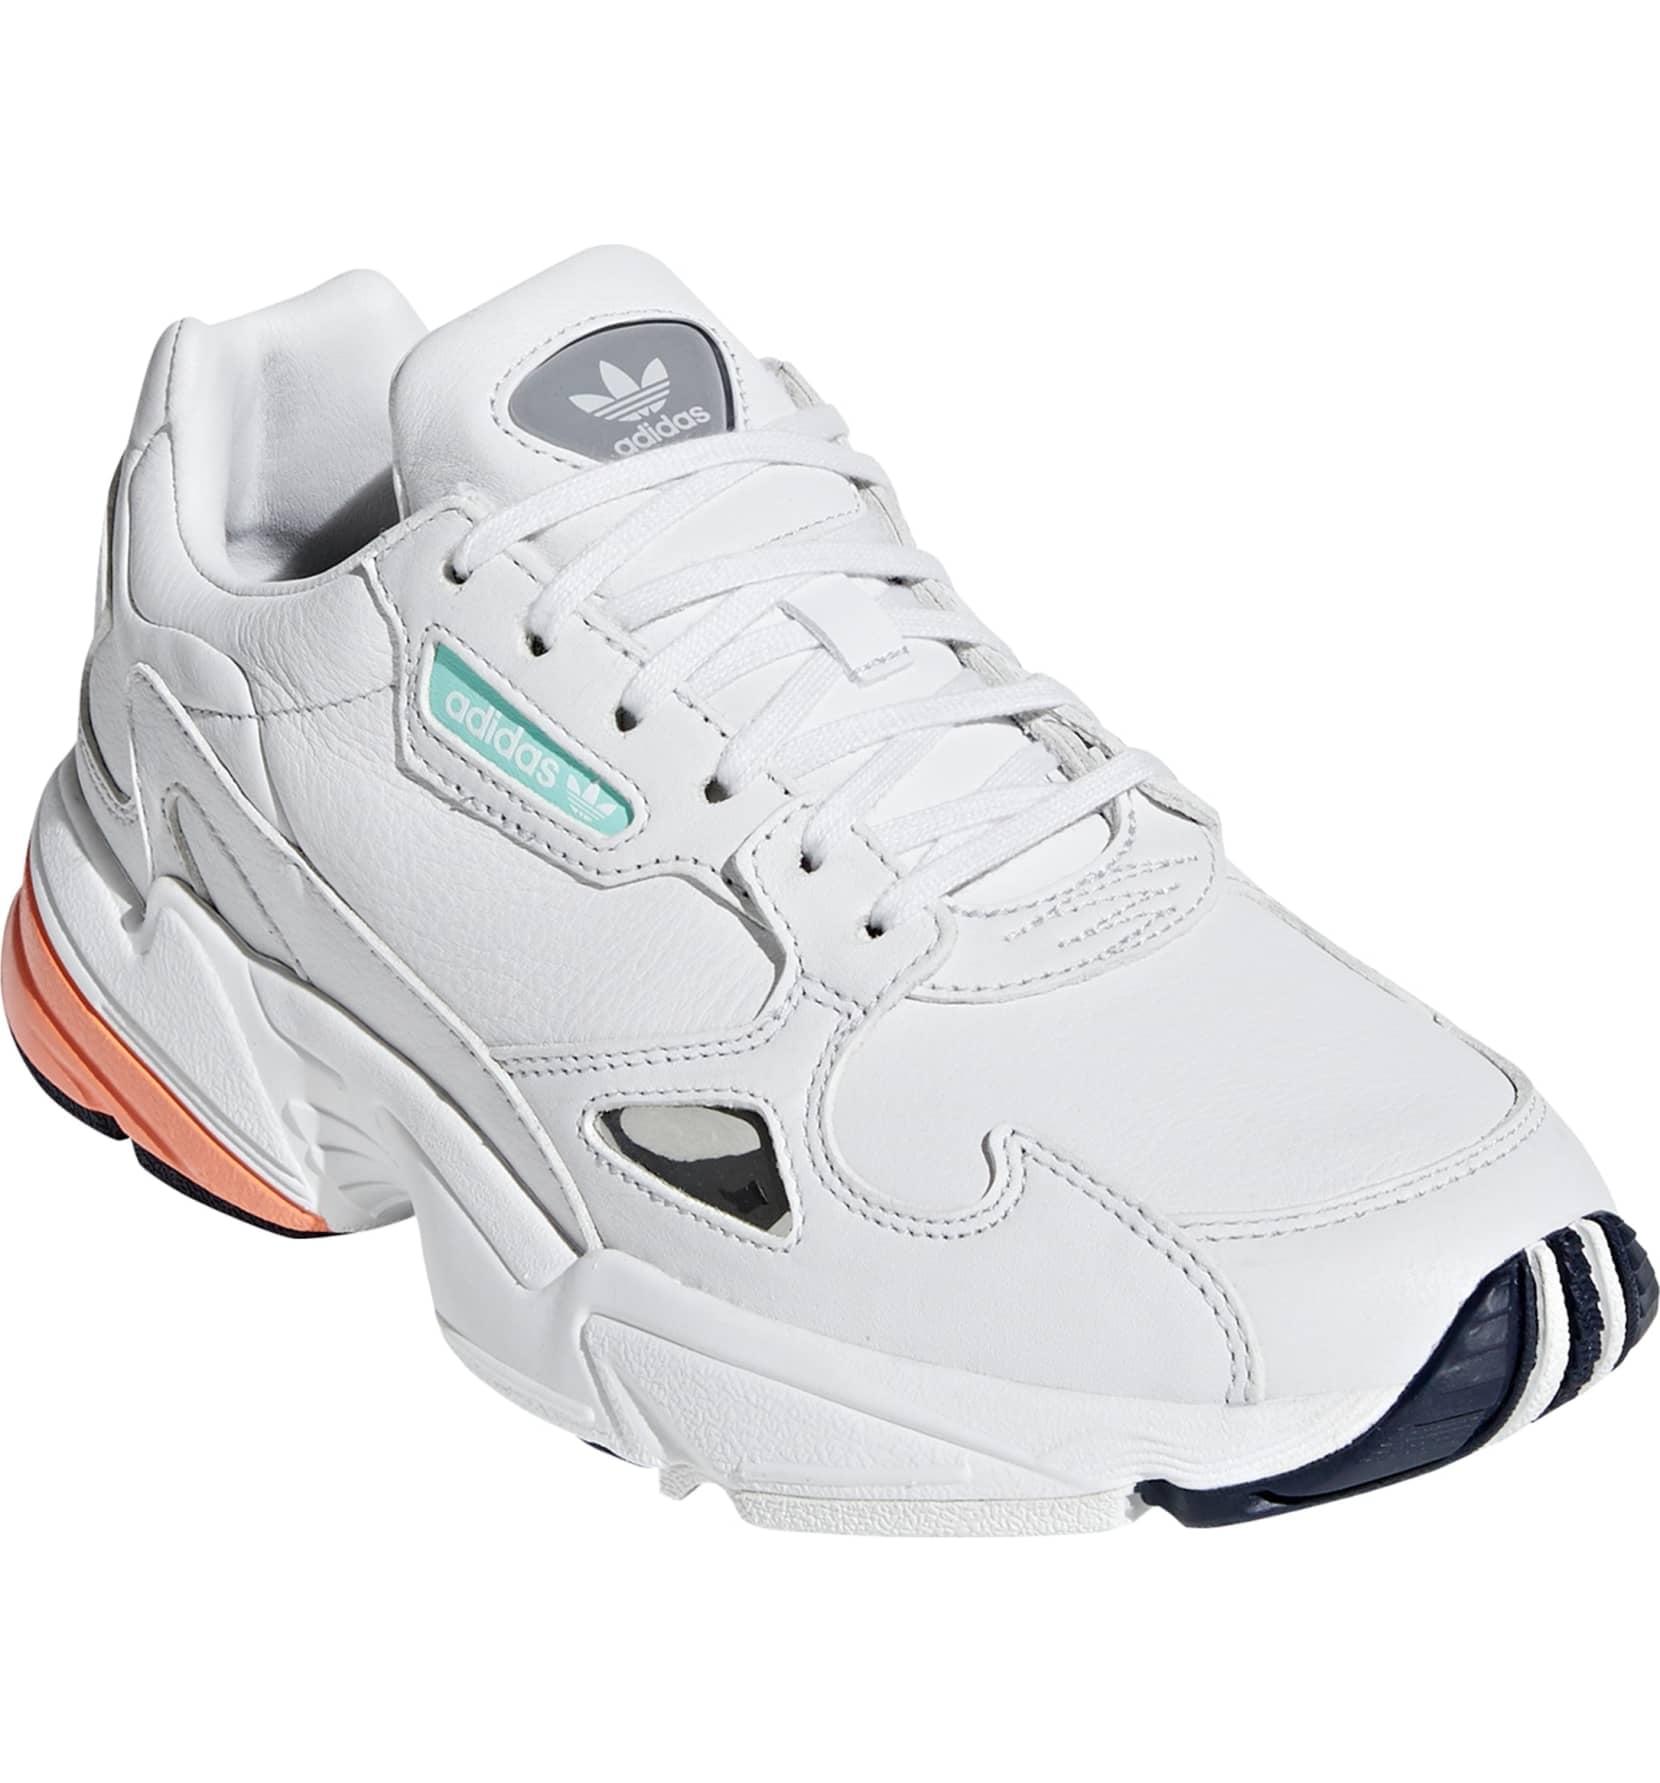 Adidas Falcon Sneaker | No Need to